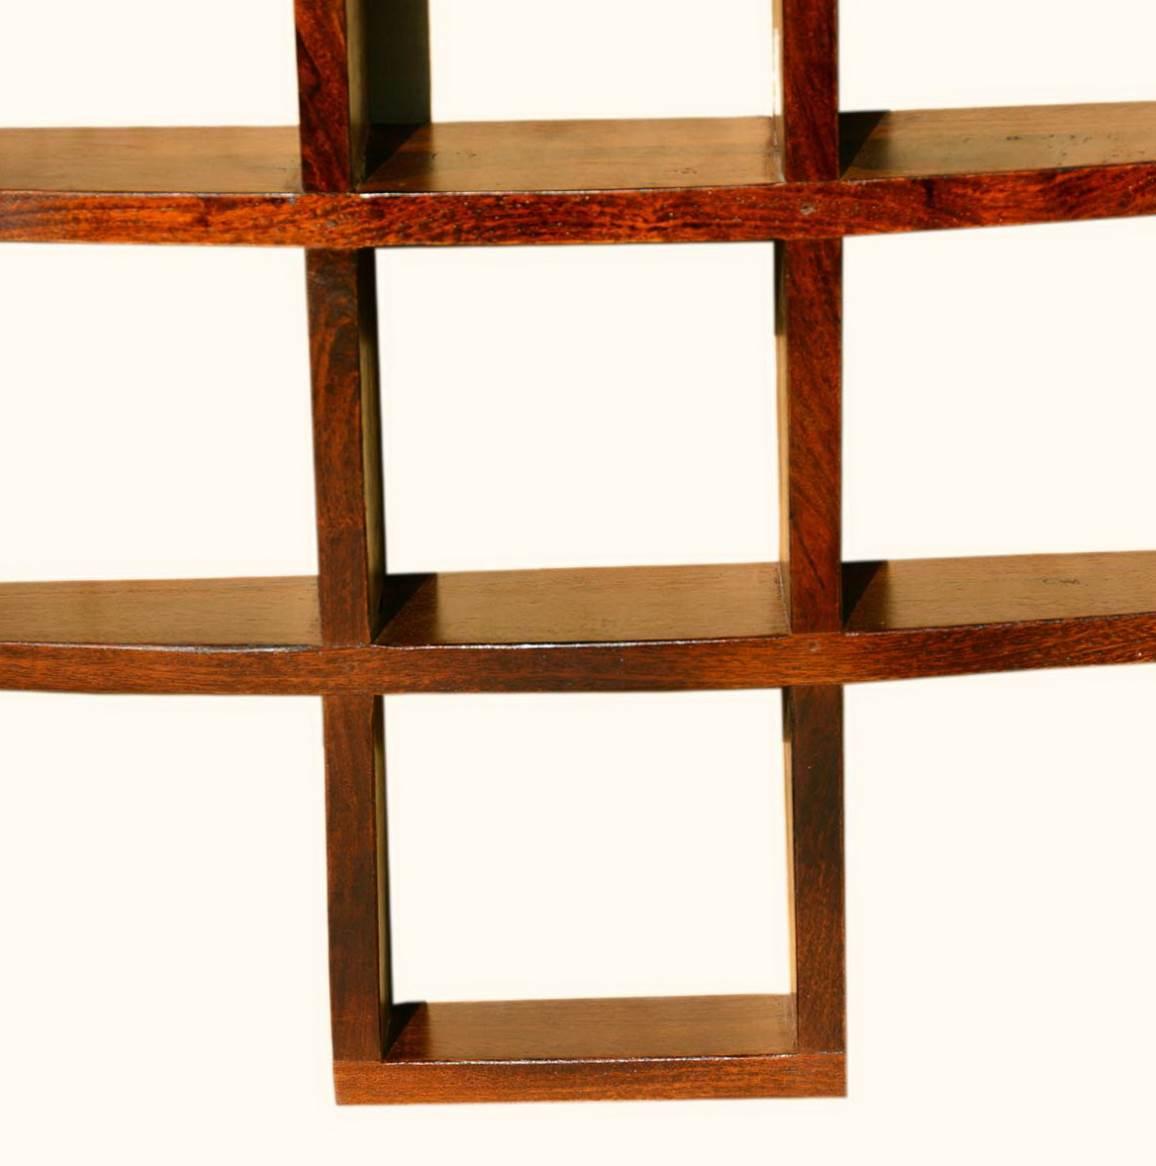 wooden wall shelves design photo - 8